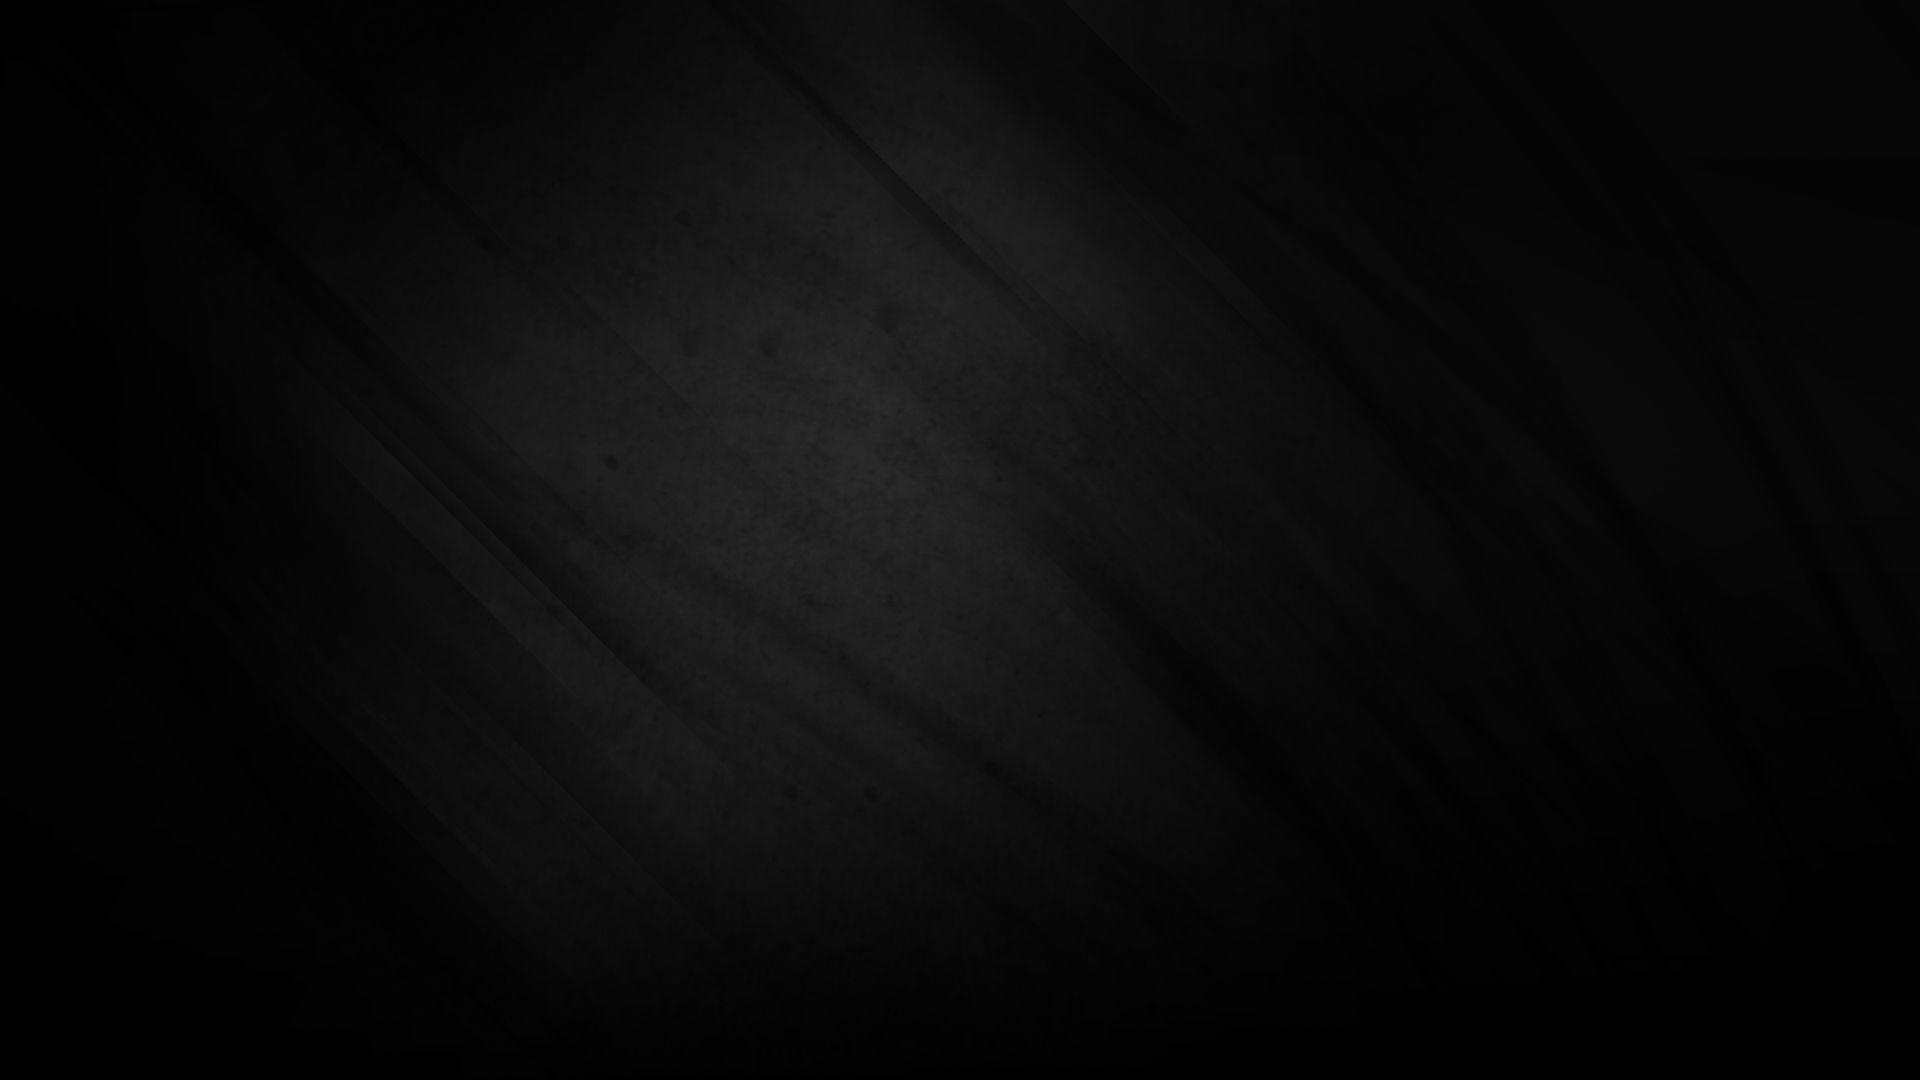 Unduh 540+ Background Black Hd Free Download HD Terbaru